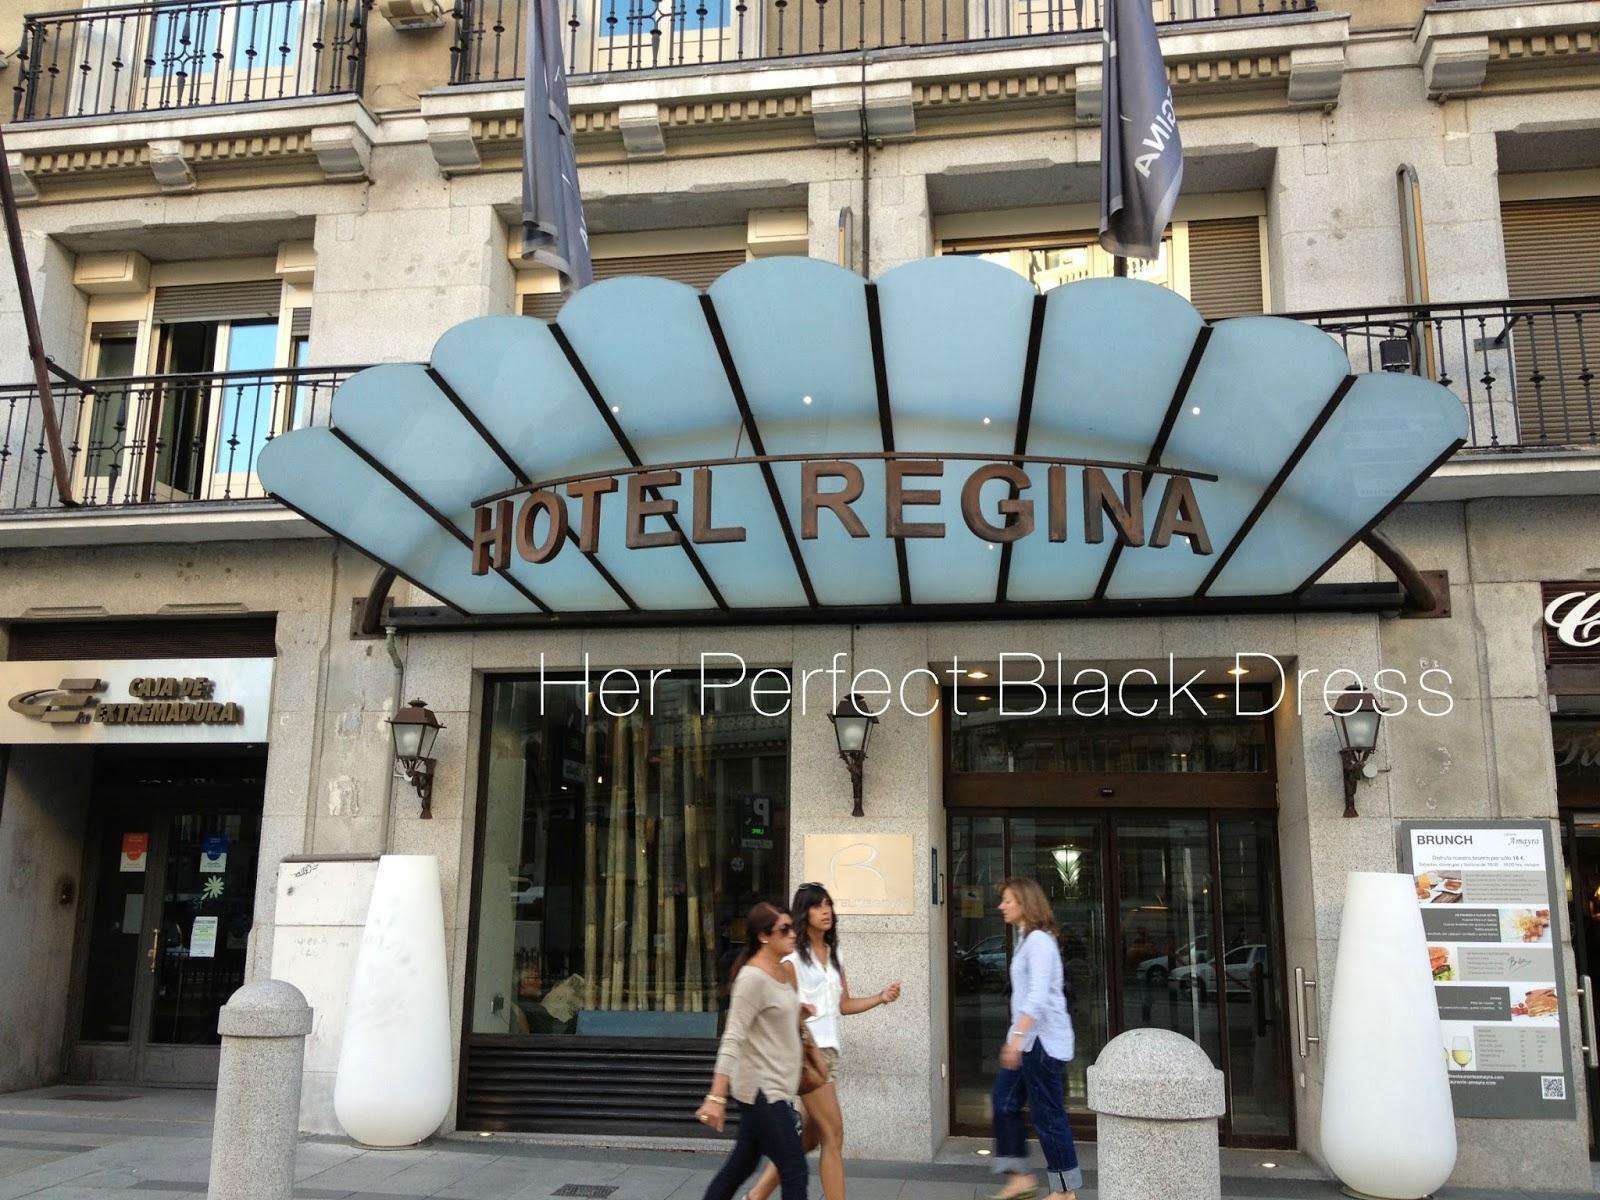 Travel tuesday madrid spain reginia cordell for Hotel regina madrid opiniones